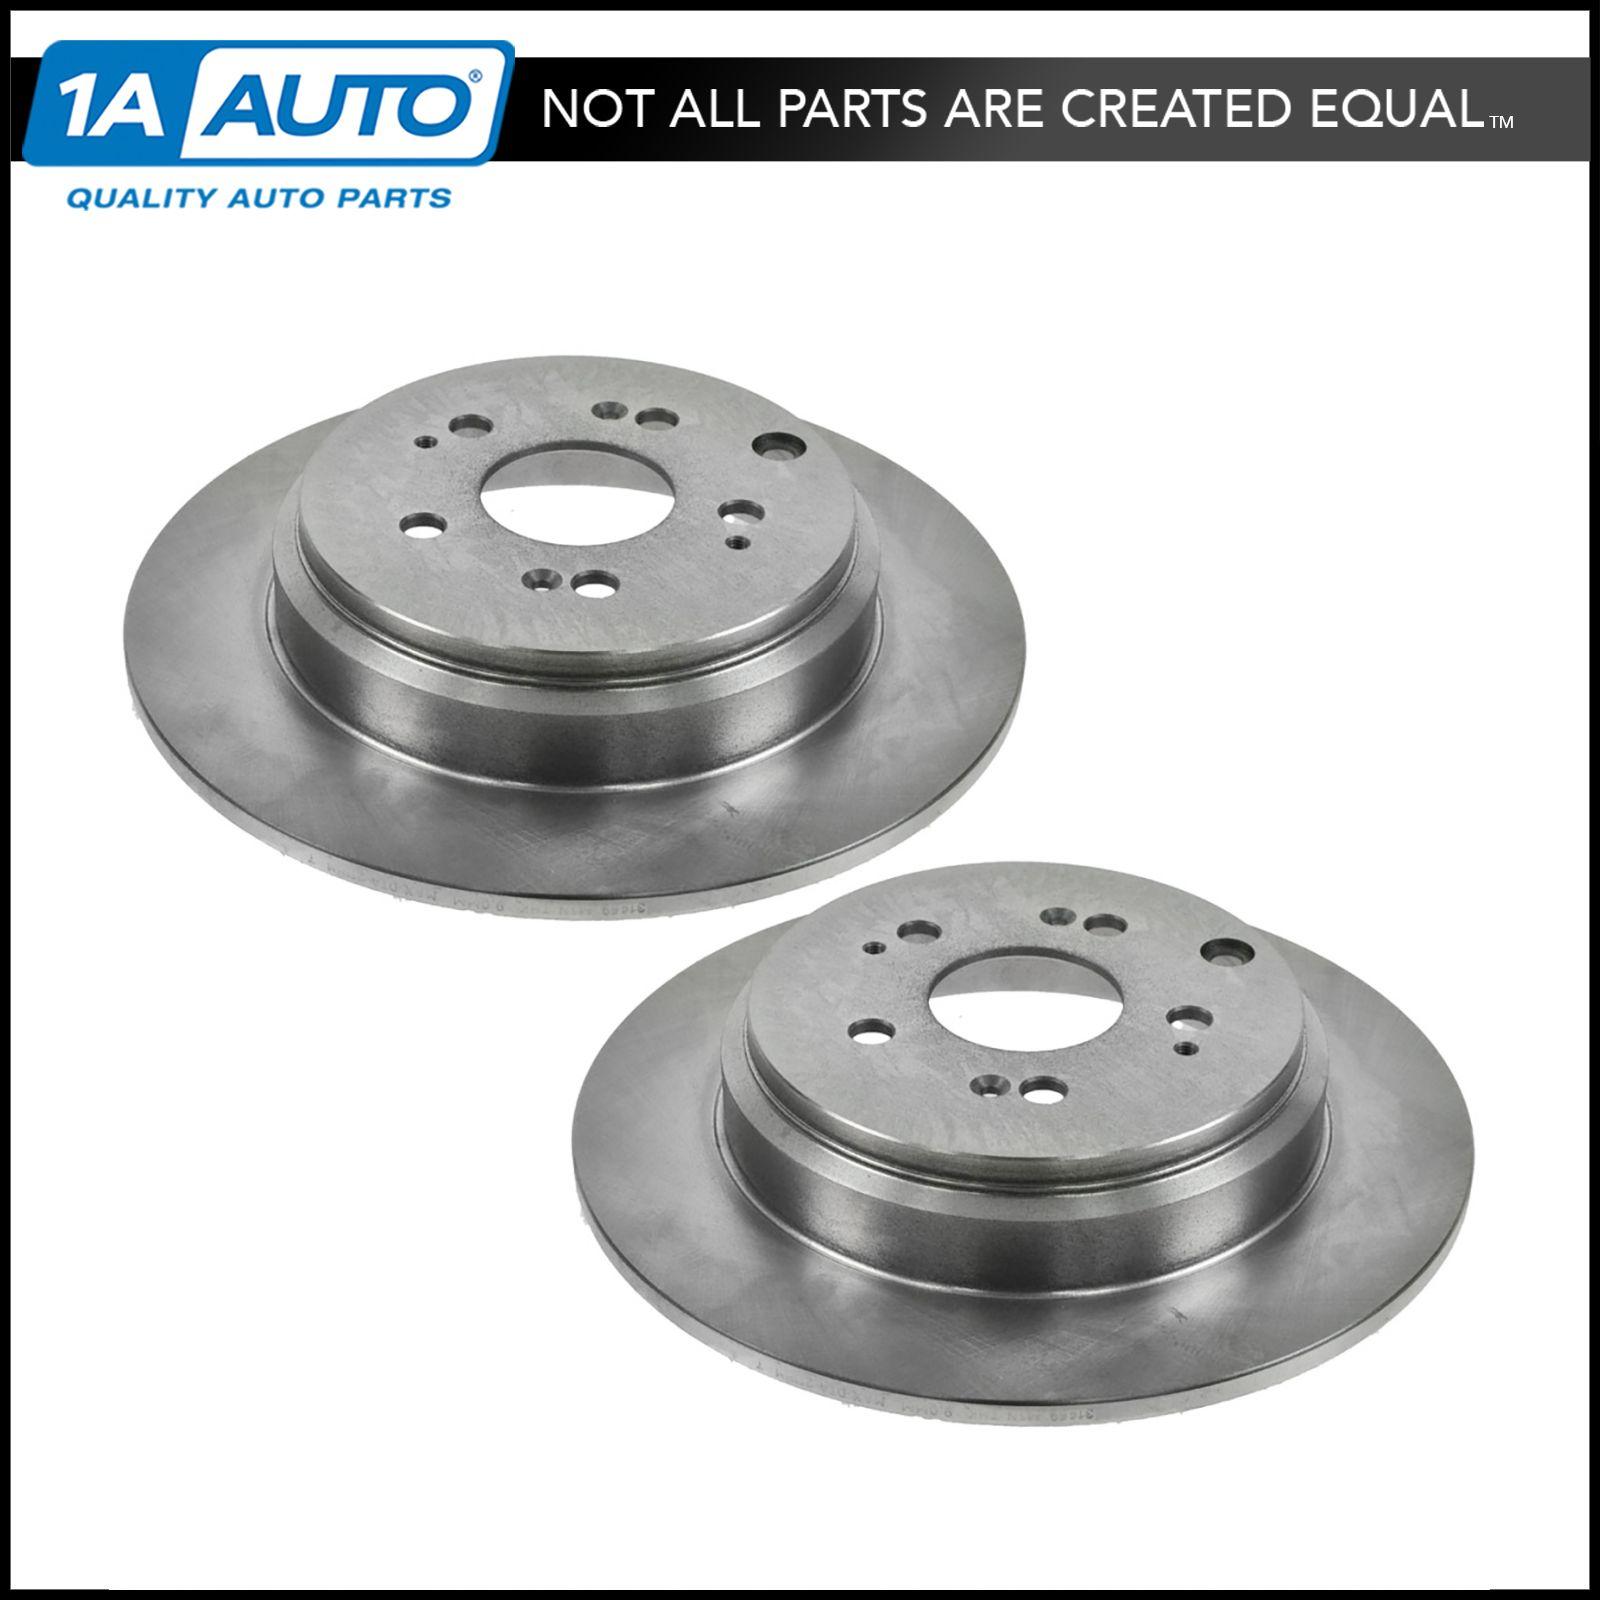 Rear Disc Brake Rotor & Pair For Acura MDX ZDX Honda